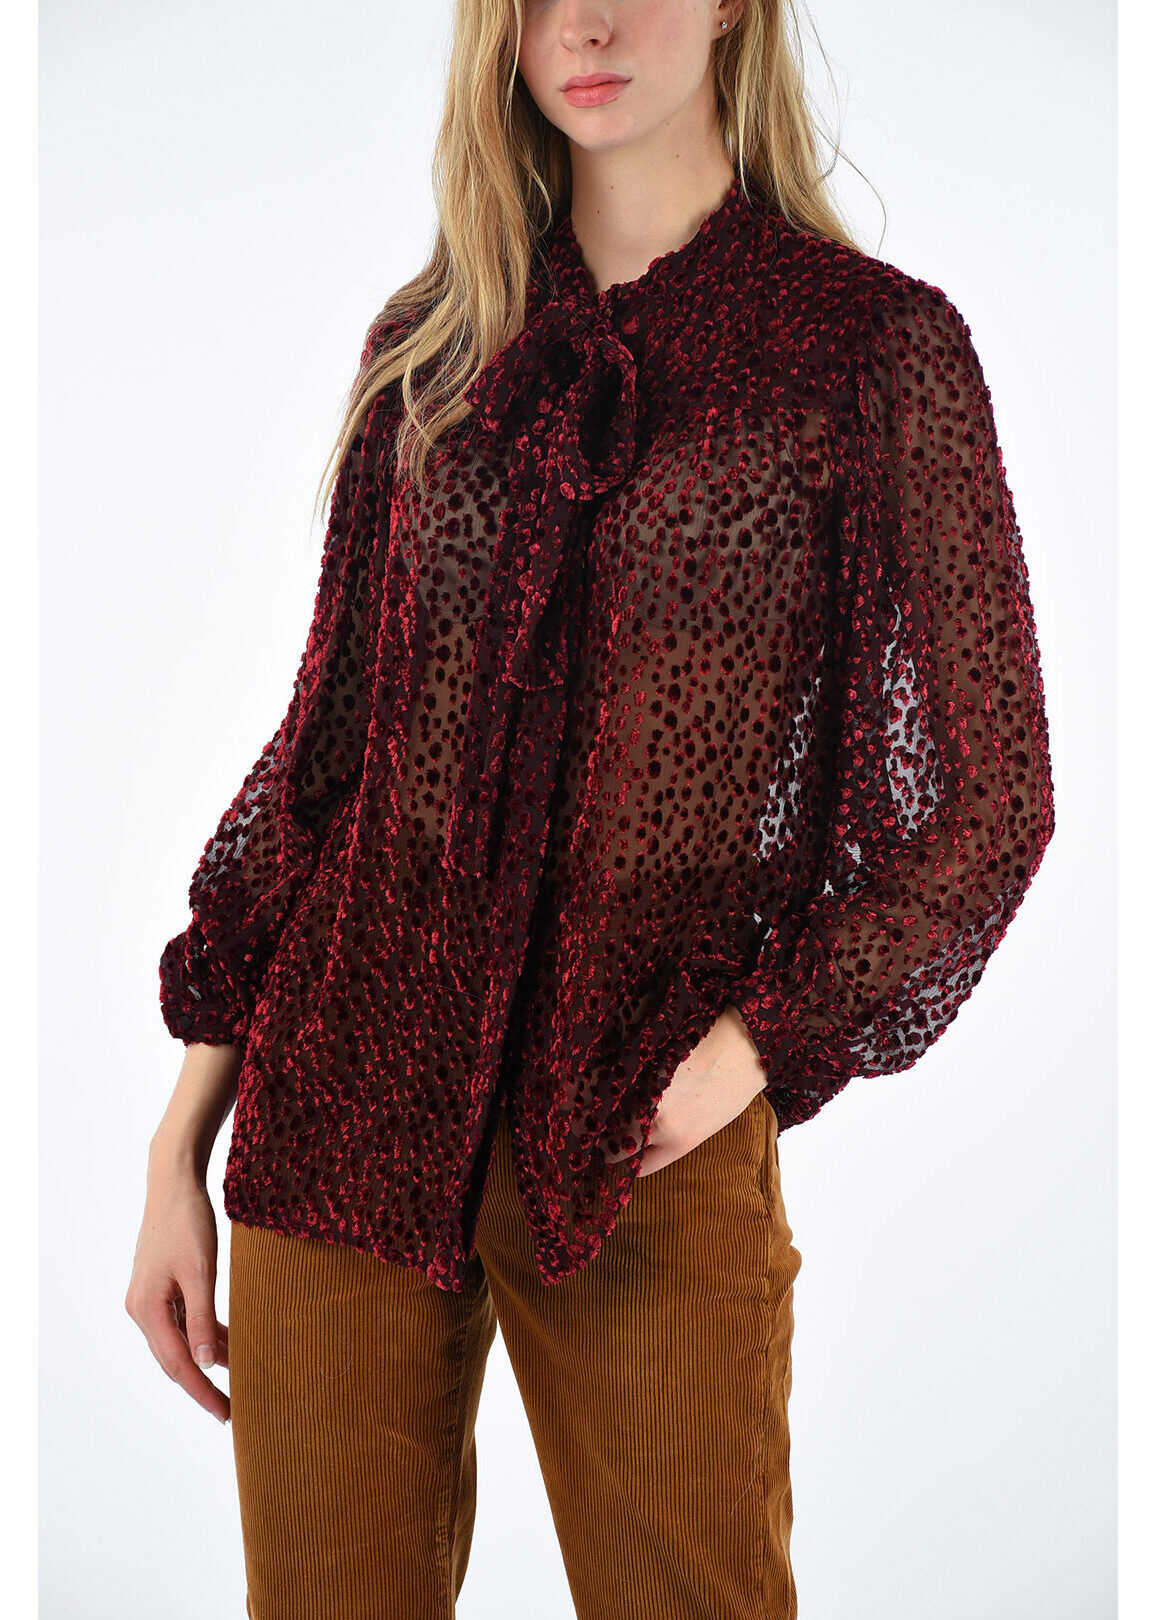 Saint Laurent polka dots embroidered blouse BURGUNDY